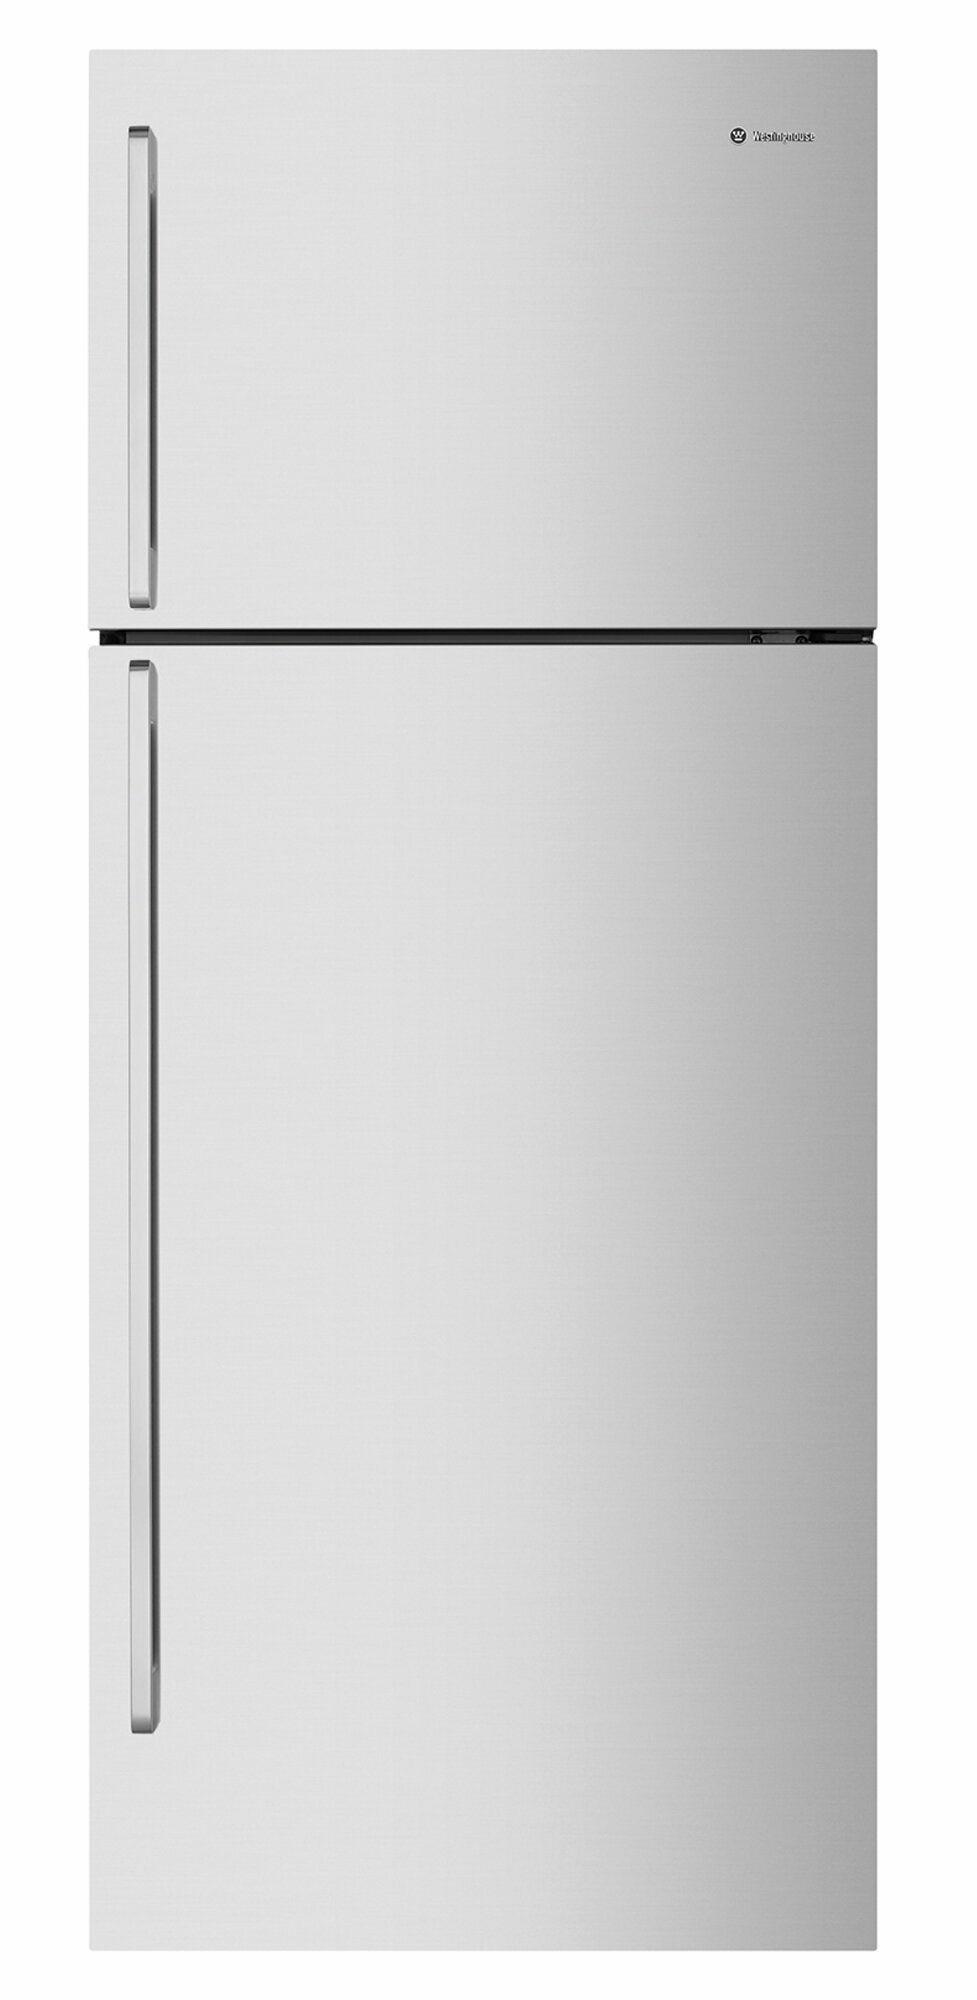 Westinghouse WTB4604SC-R Refrigerator